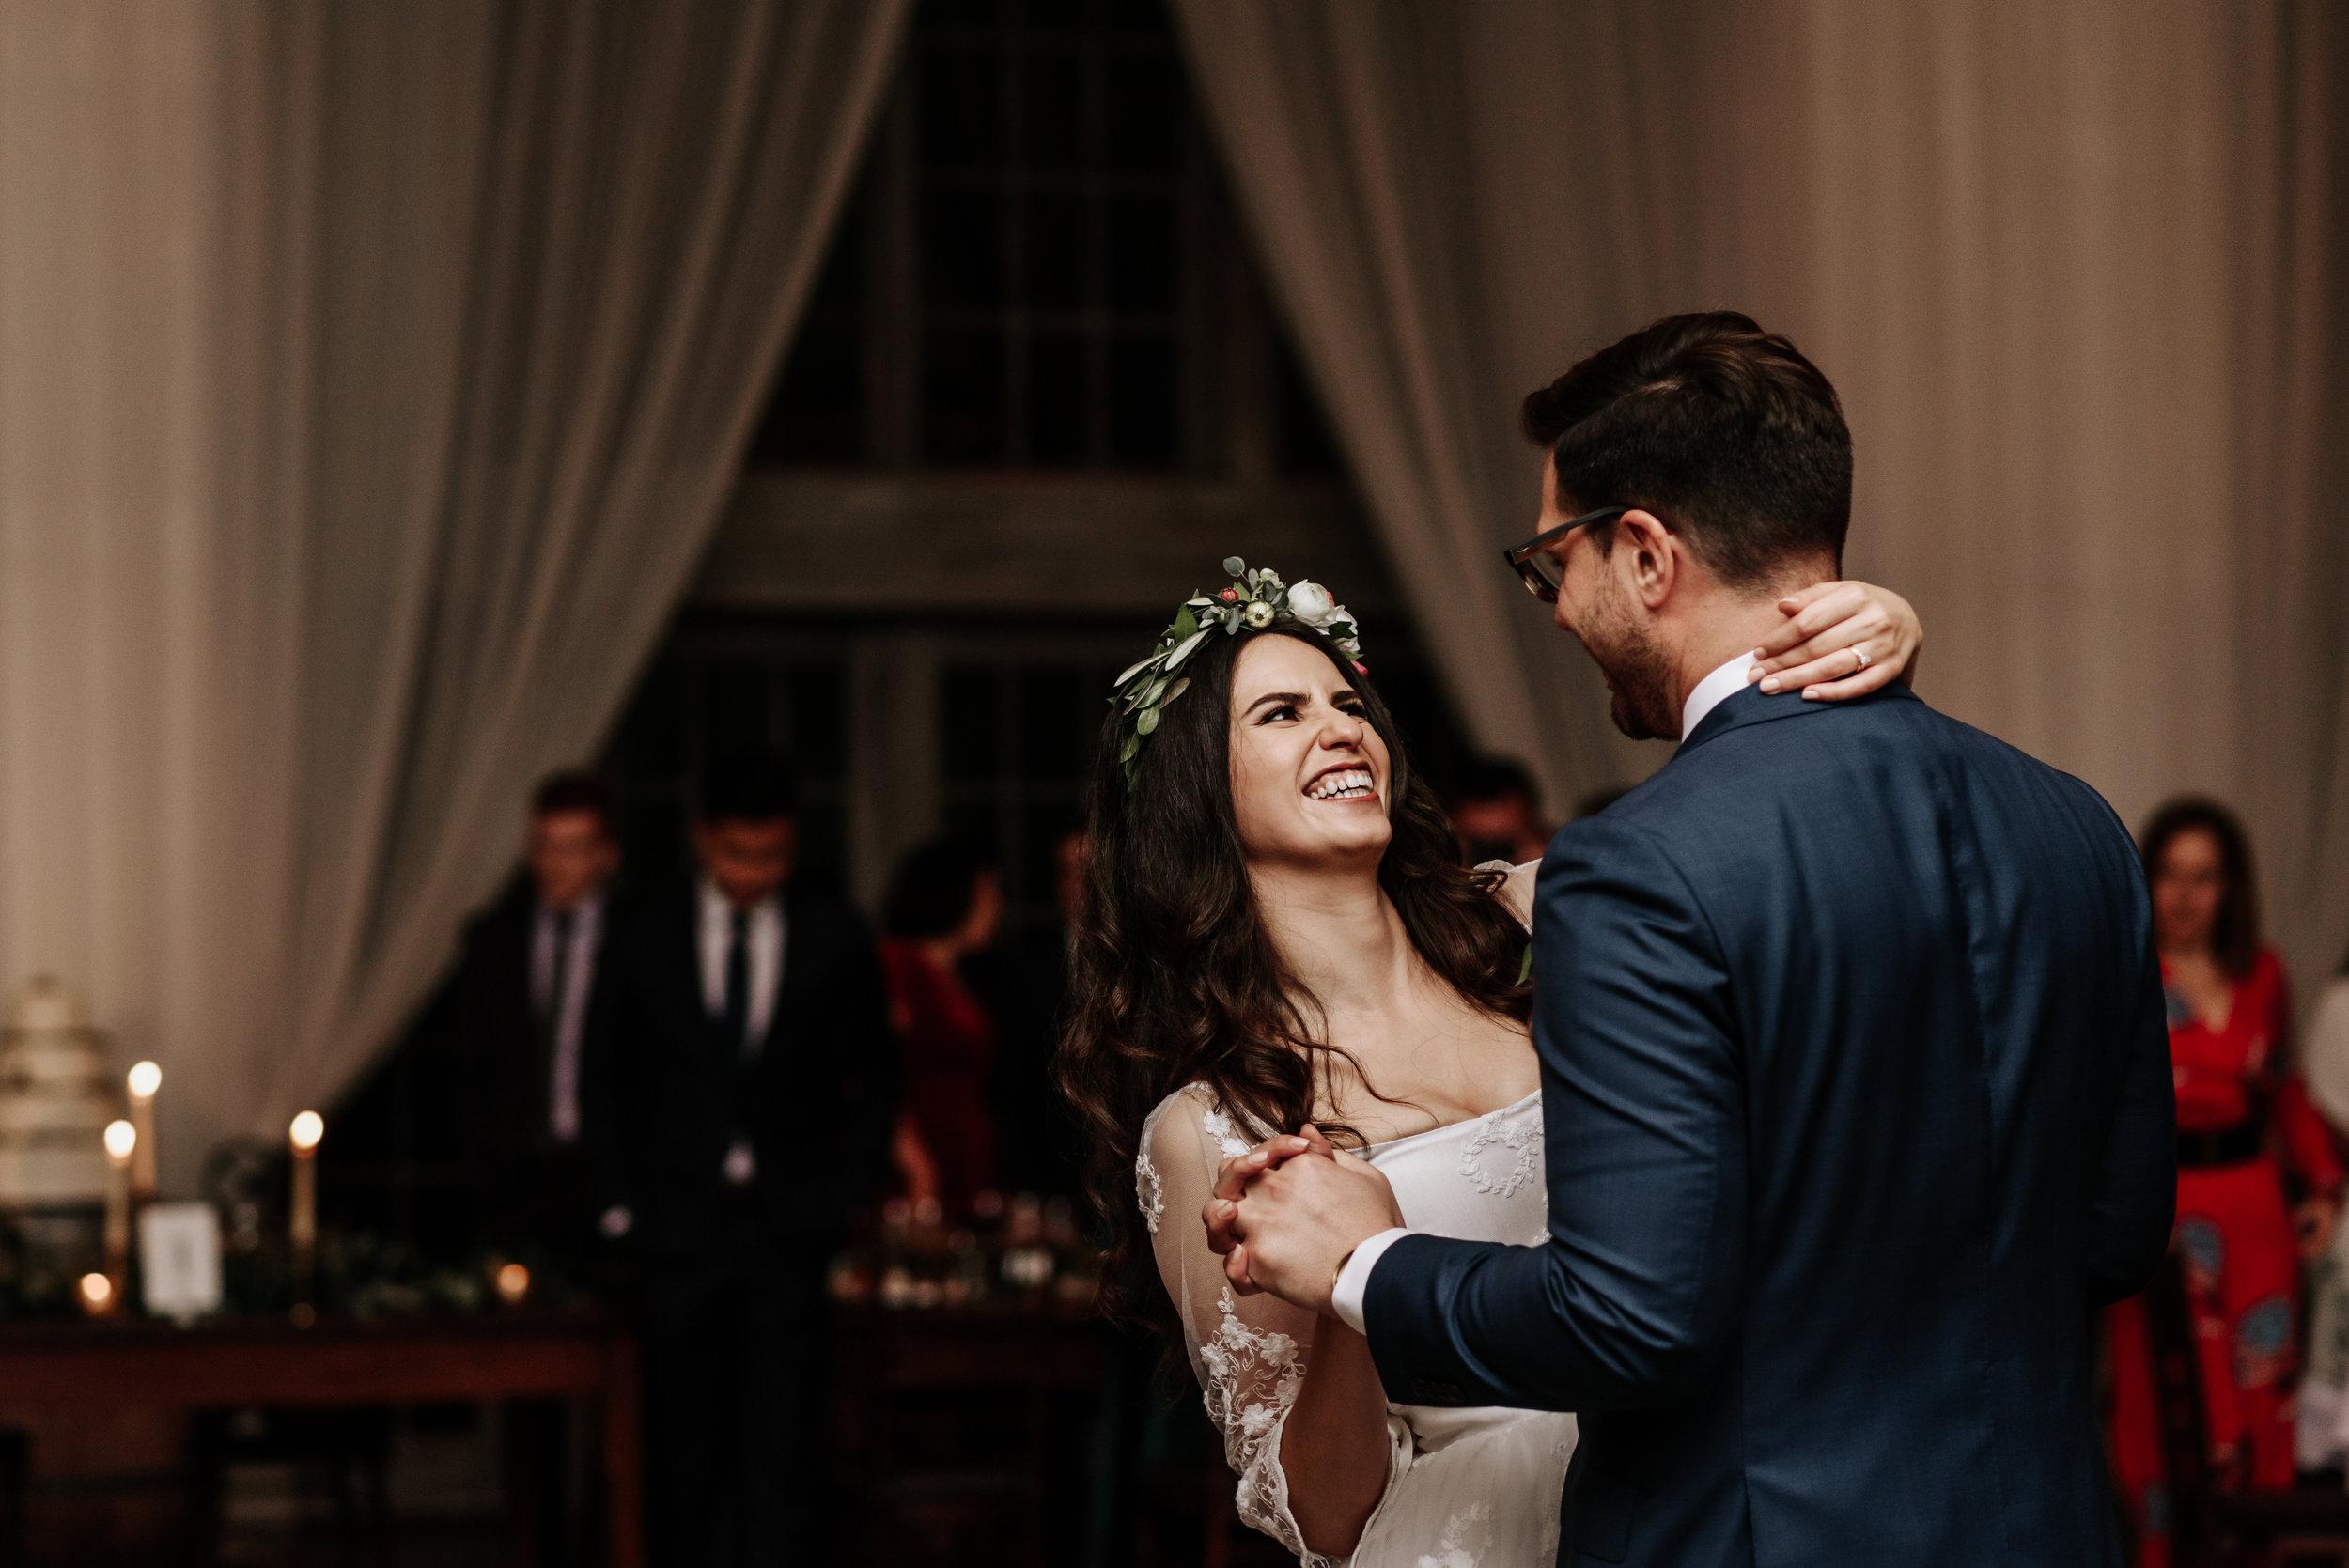 Veritas-Vineyards-and-Winery-Wedding-Photography-Afton-Virginia-Yasmin-Seth-Photography-by-V-3013.jpg